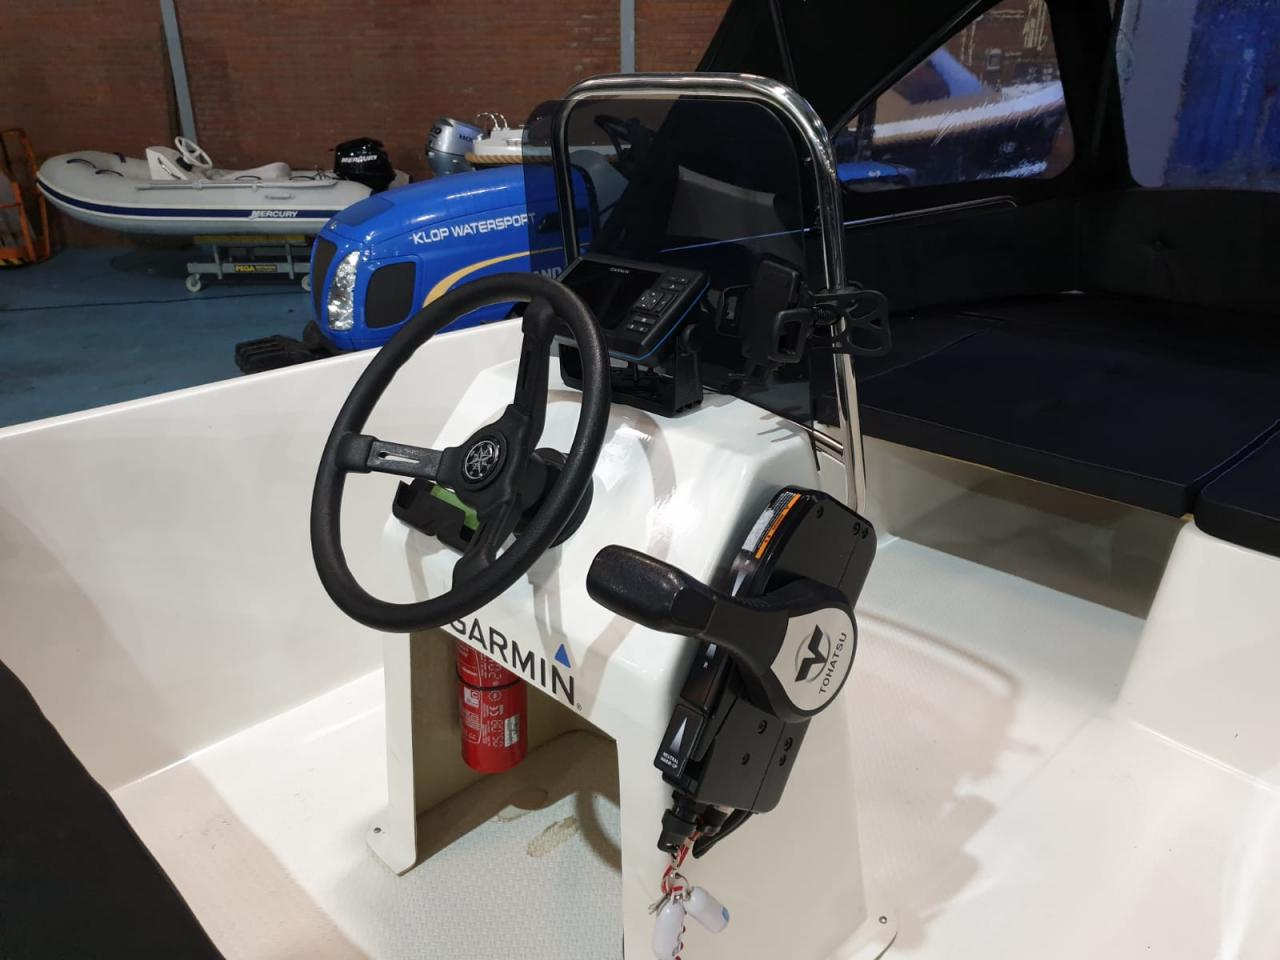 Seafinder 435 met Tohatsu 9.8 pk motor 8